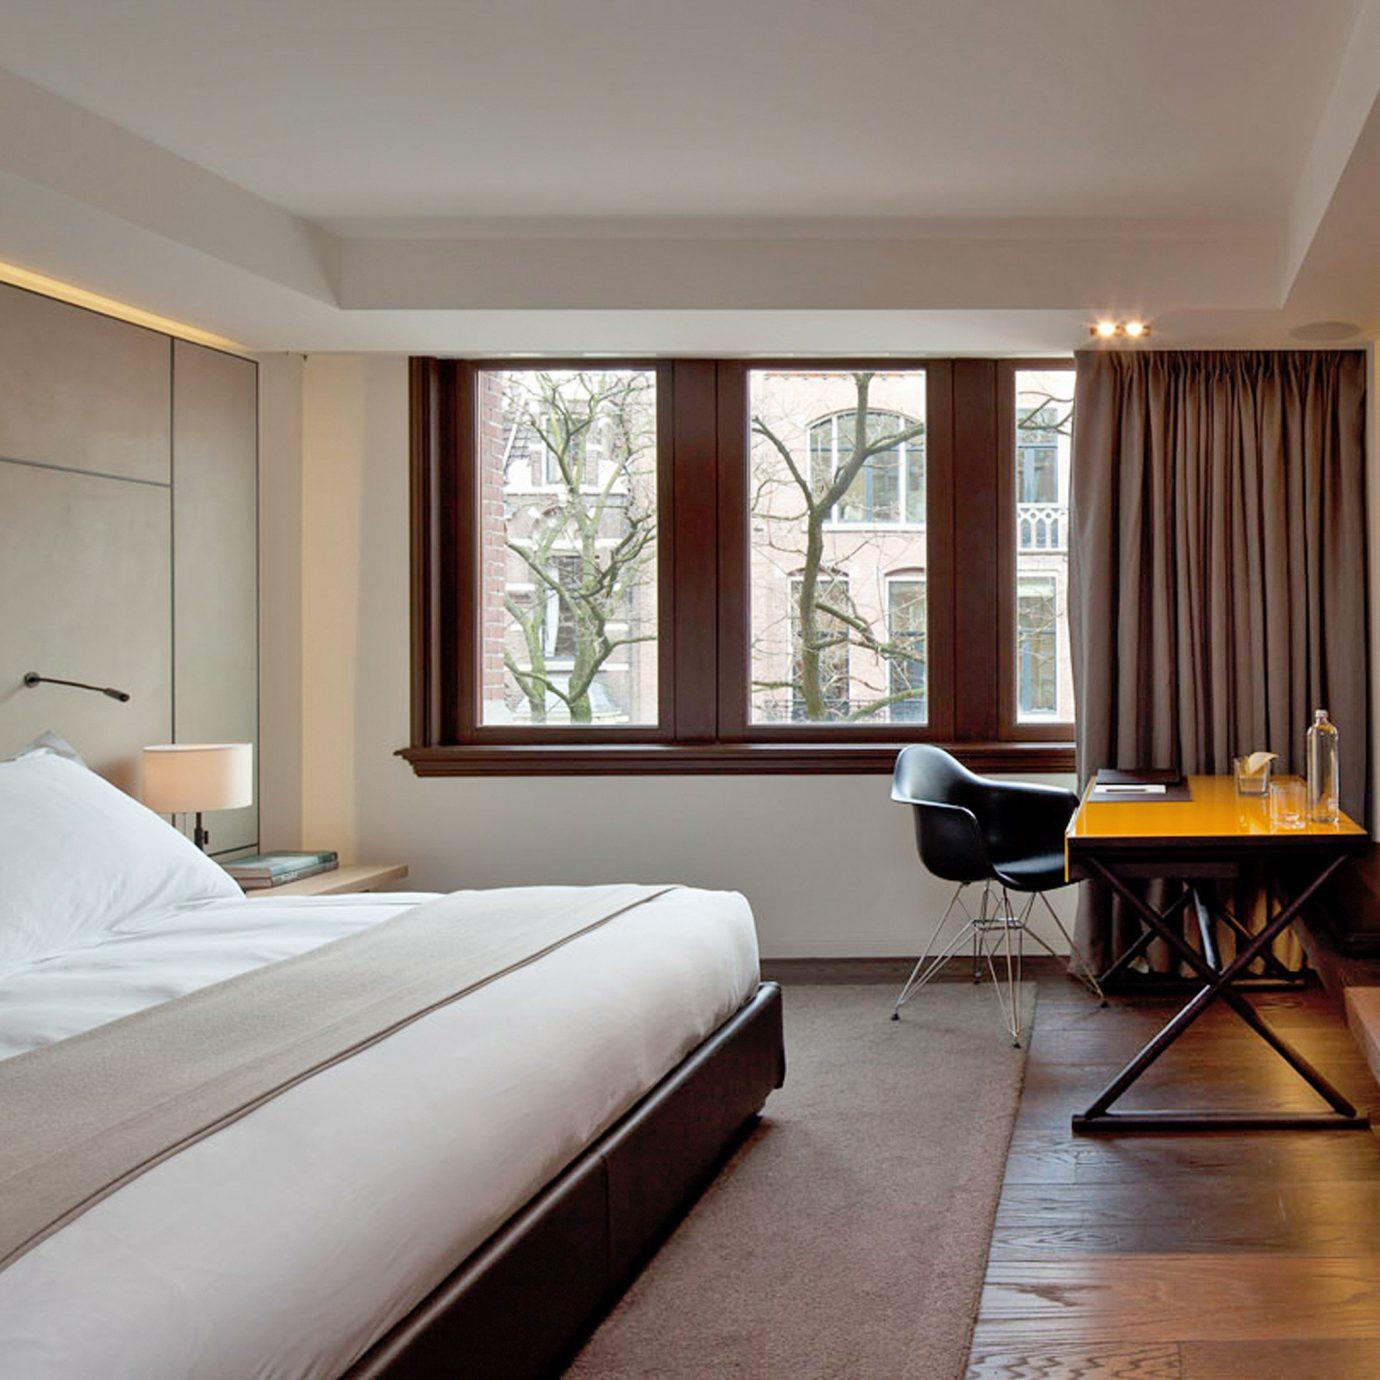 Amsterdam Bedroom Boutique Hip Hotels Modern The Netherlands property Suite hardwood home condominium living room cottage